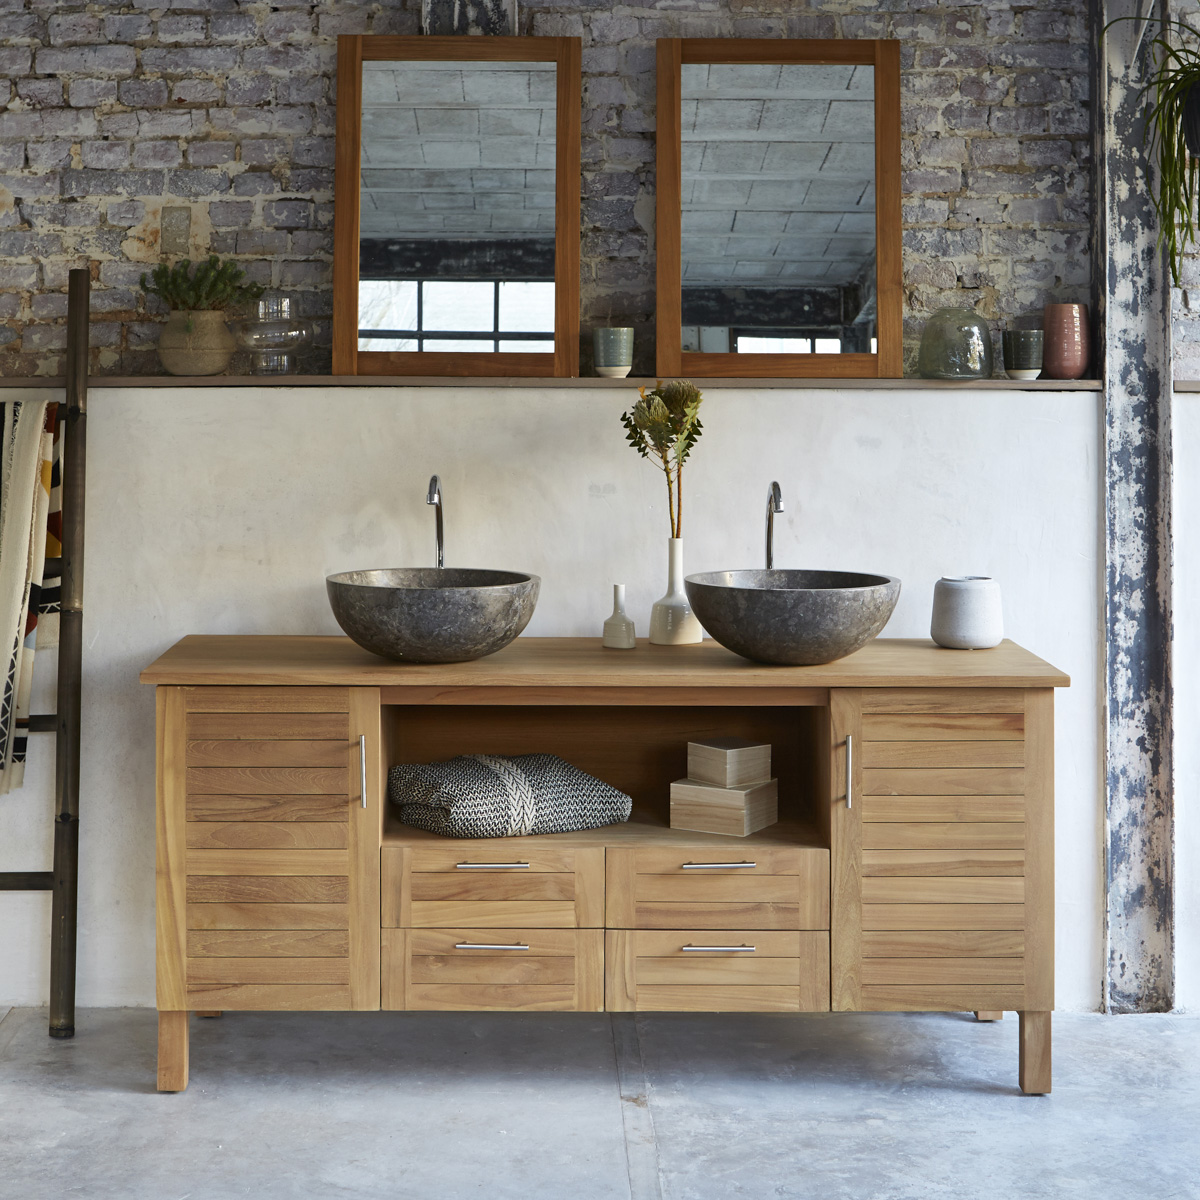 Soho solid teak Vanity Cabinet 165